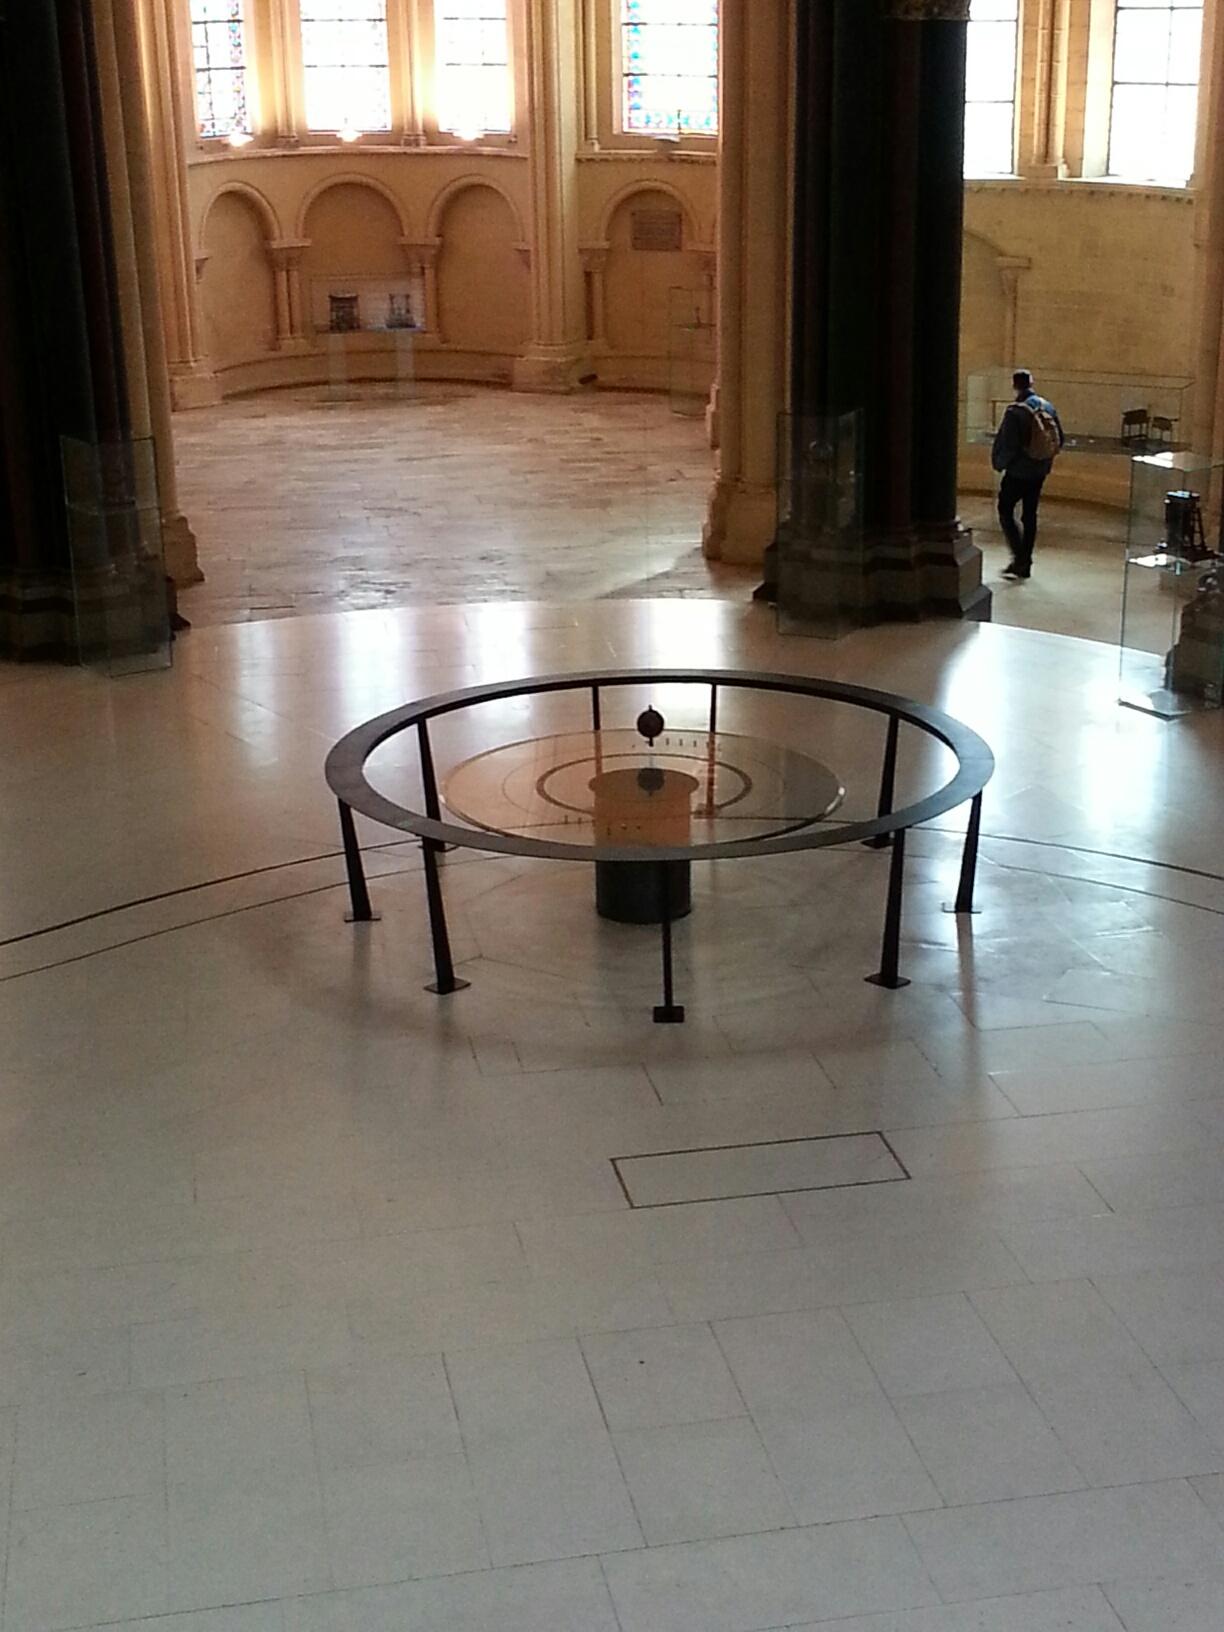 Pendulum at Arts et Metiers